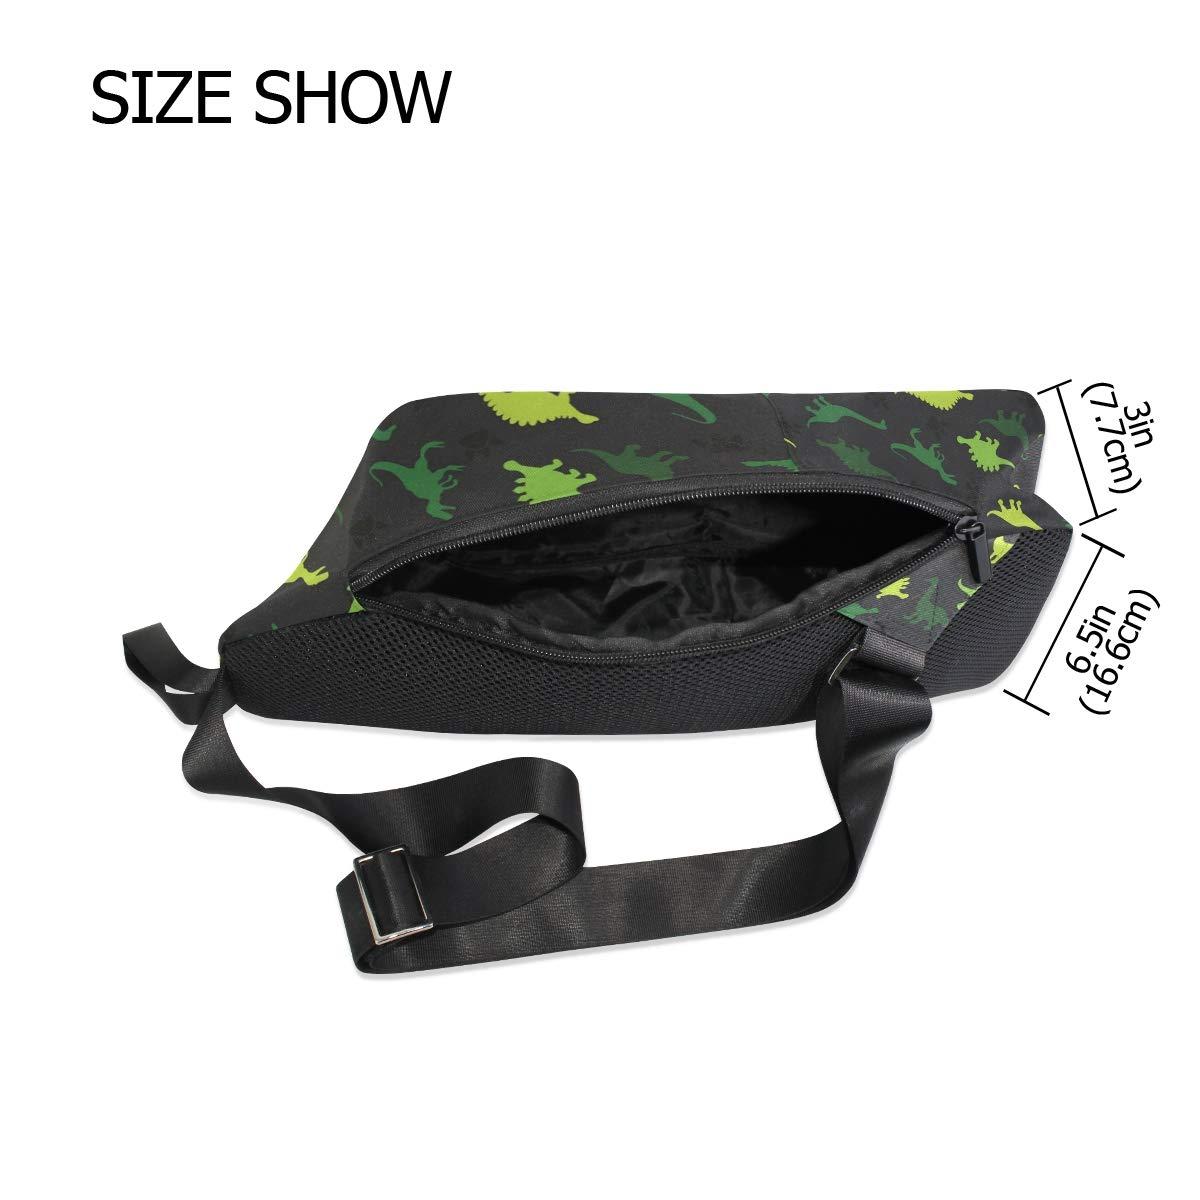 AHOMY Dinosaur Paw Print Messenger Bag Small Travel School Sling Bag Crossbody Bag